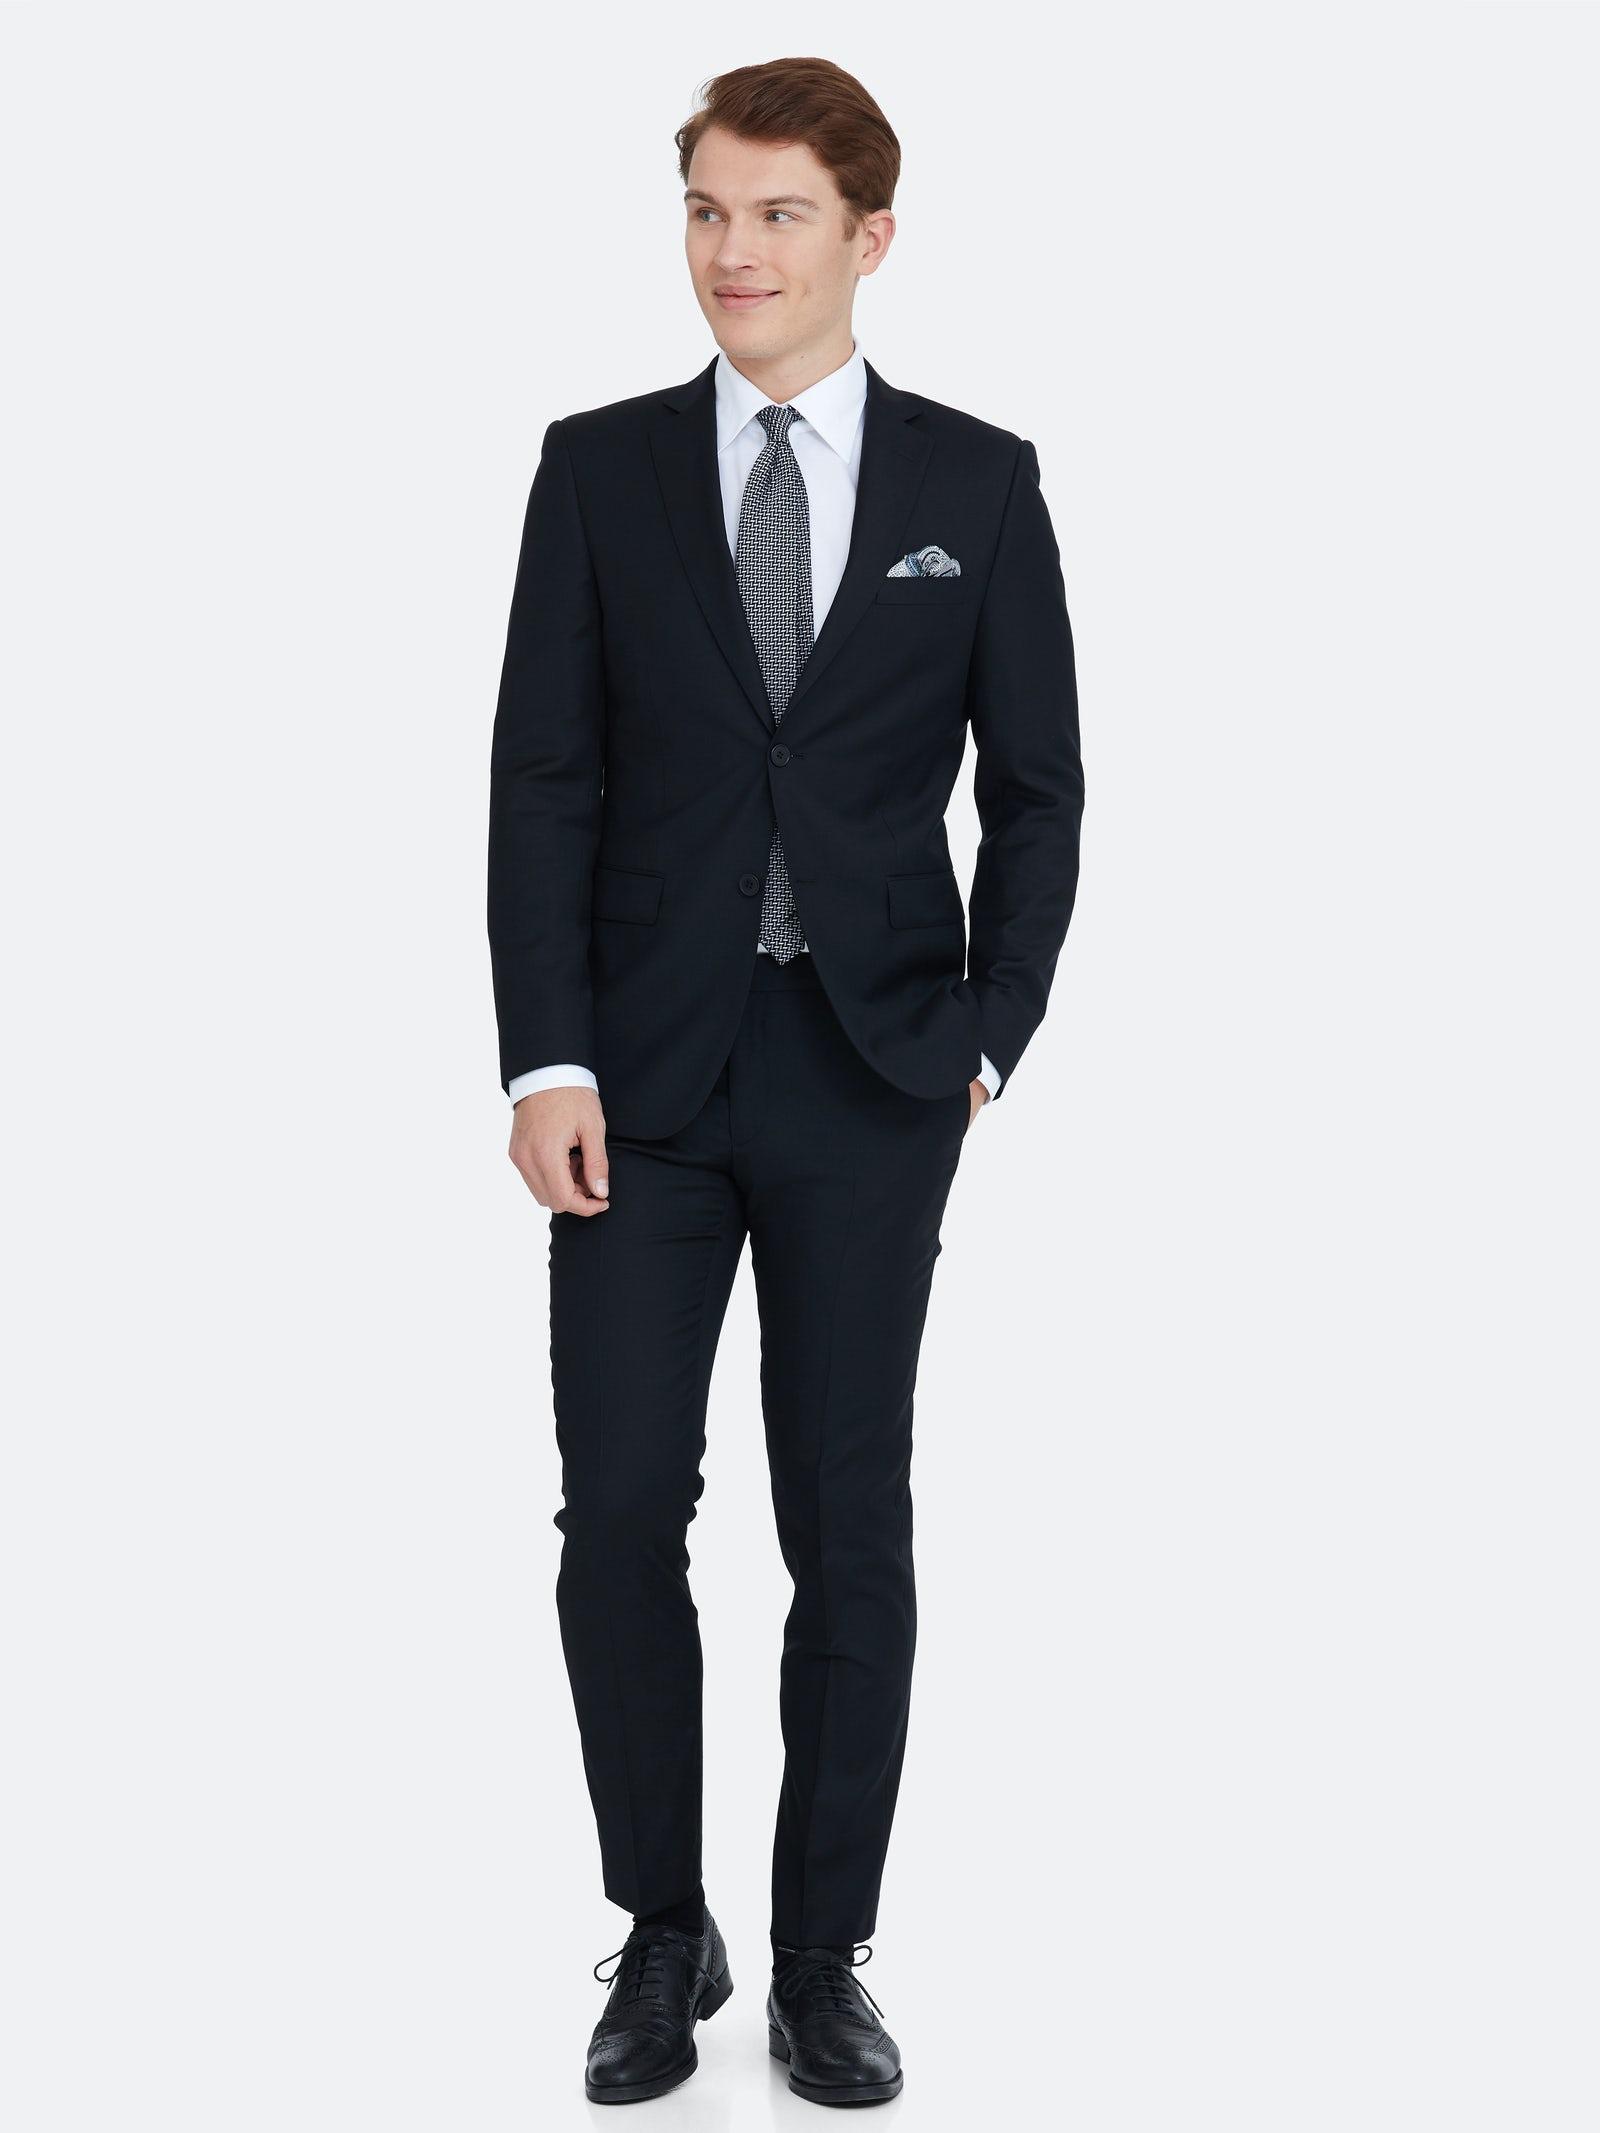 Miesten puku, koko 50 (Dressman Batistini)